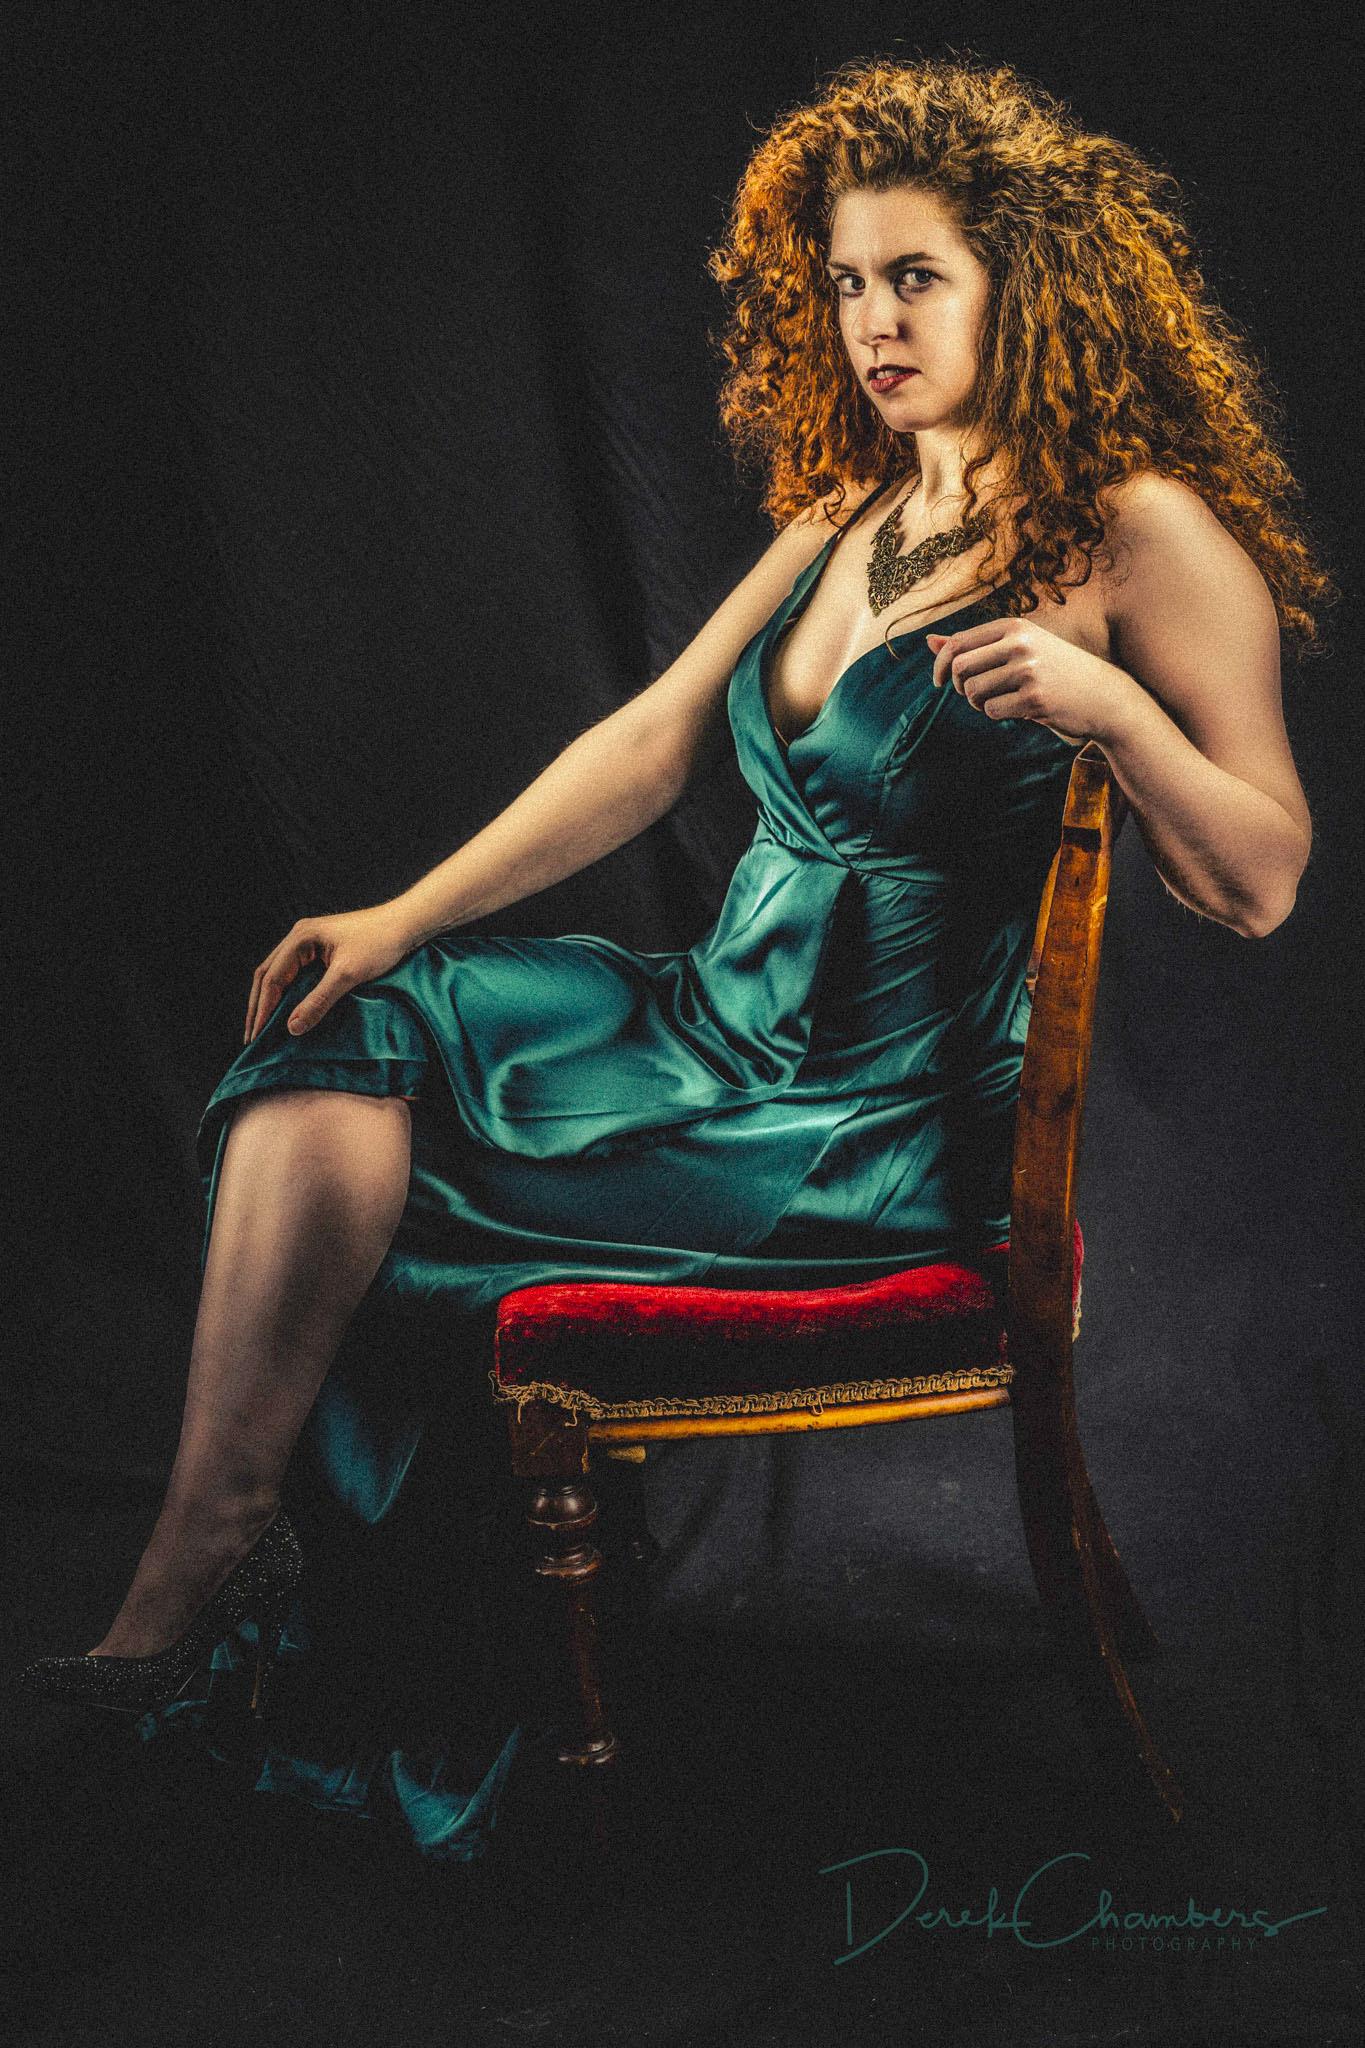 K35-S3308 - Hard Nosed Woman in a Green Dress - Derek Chambers